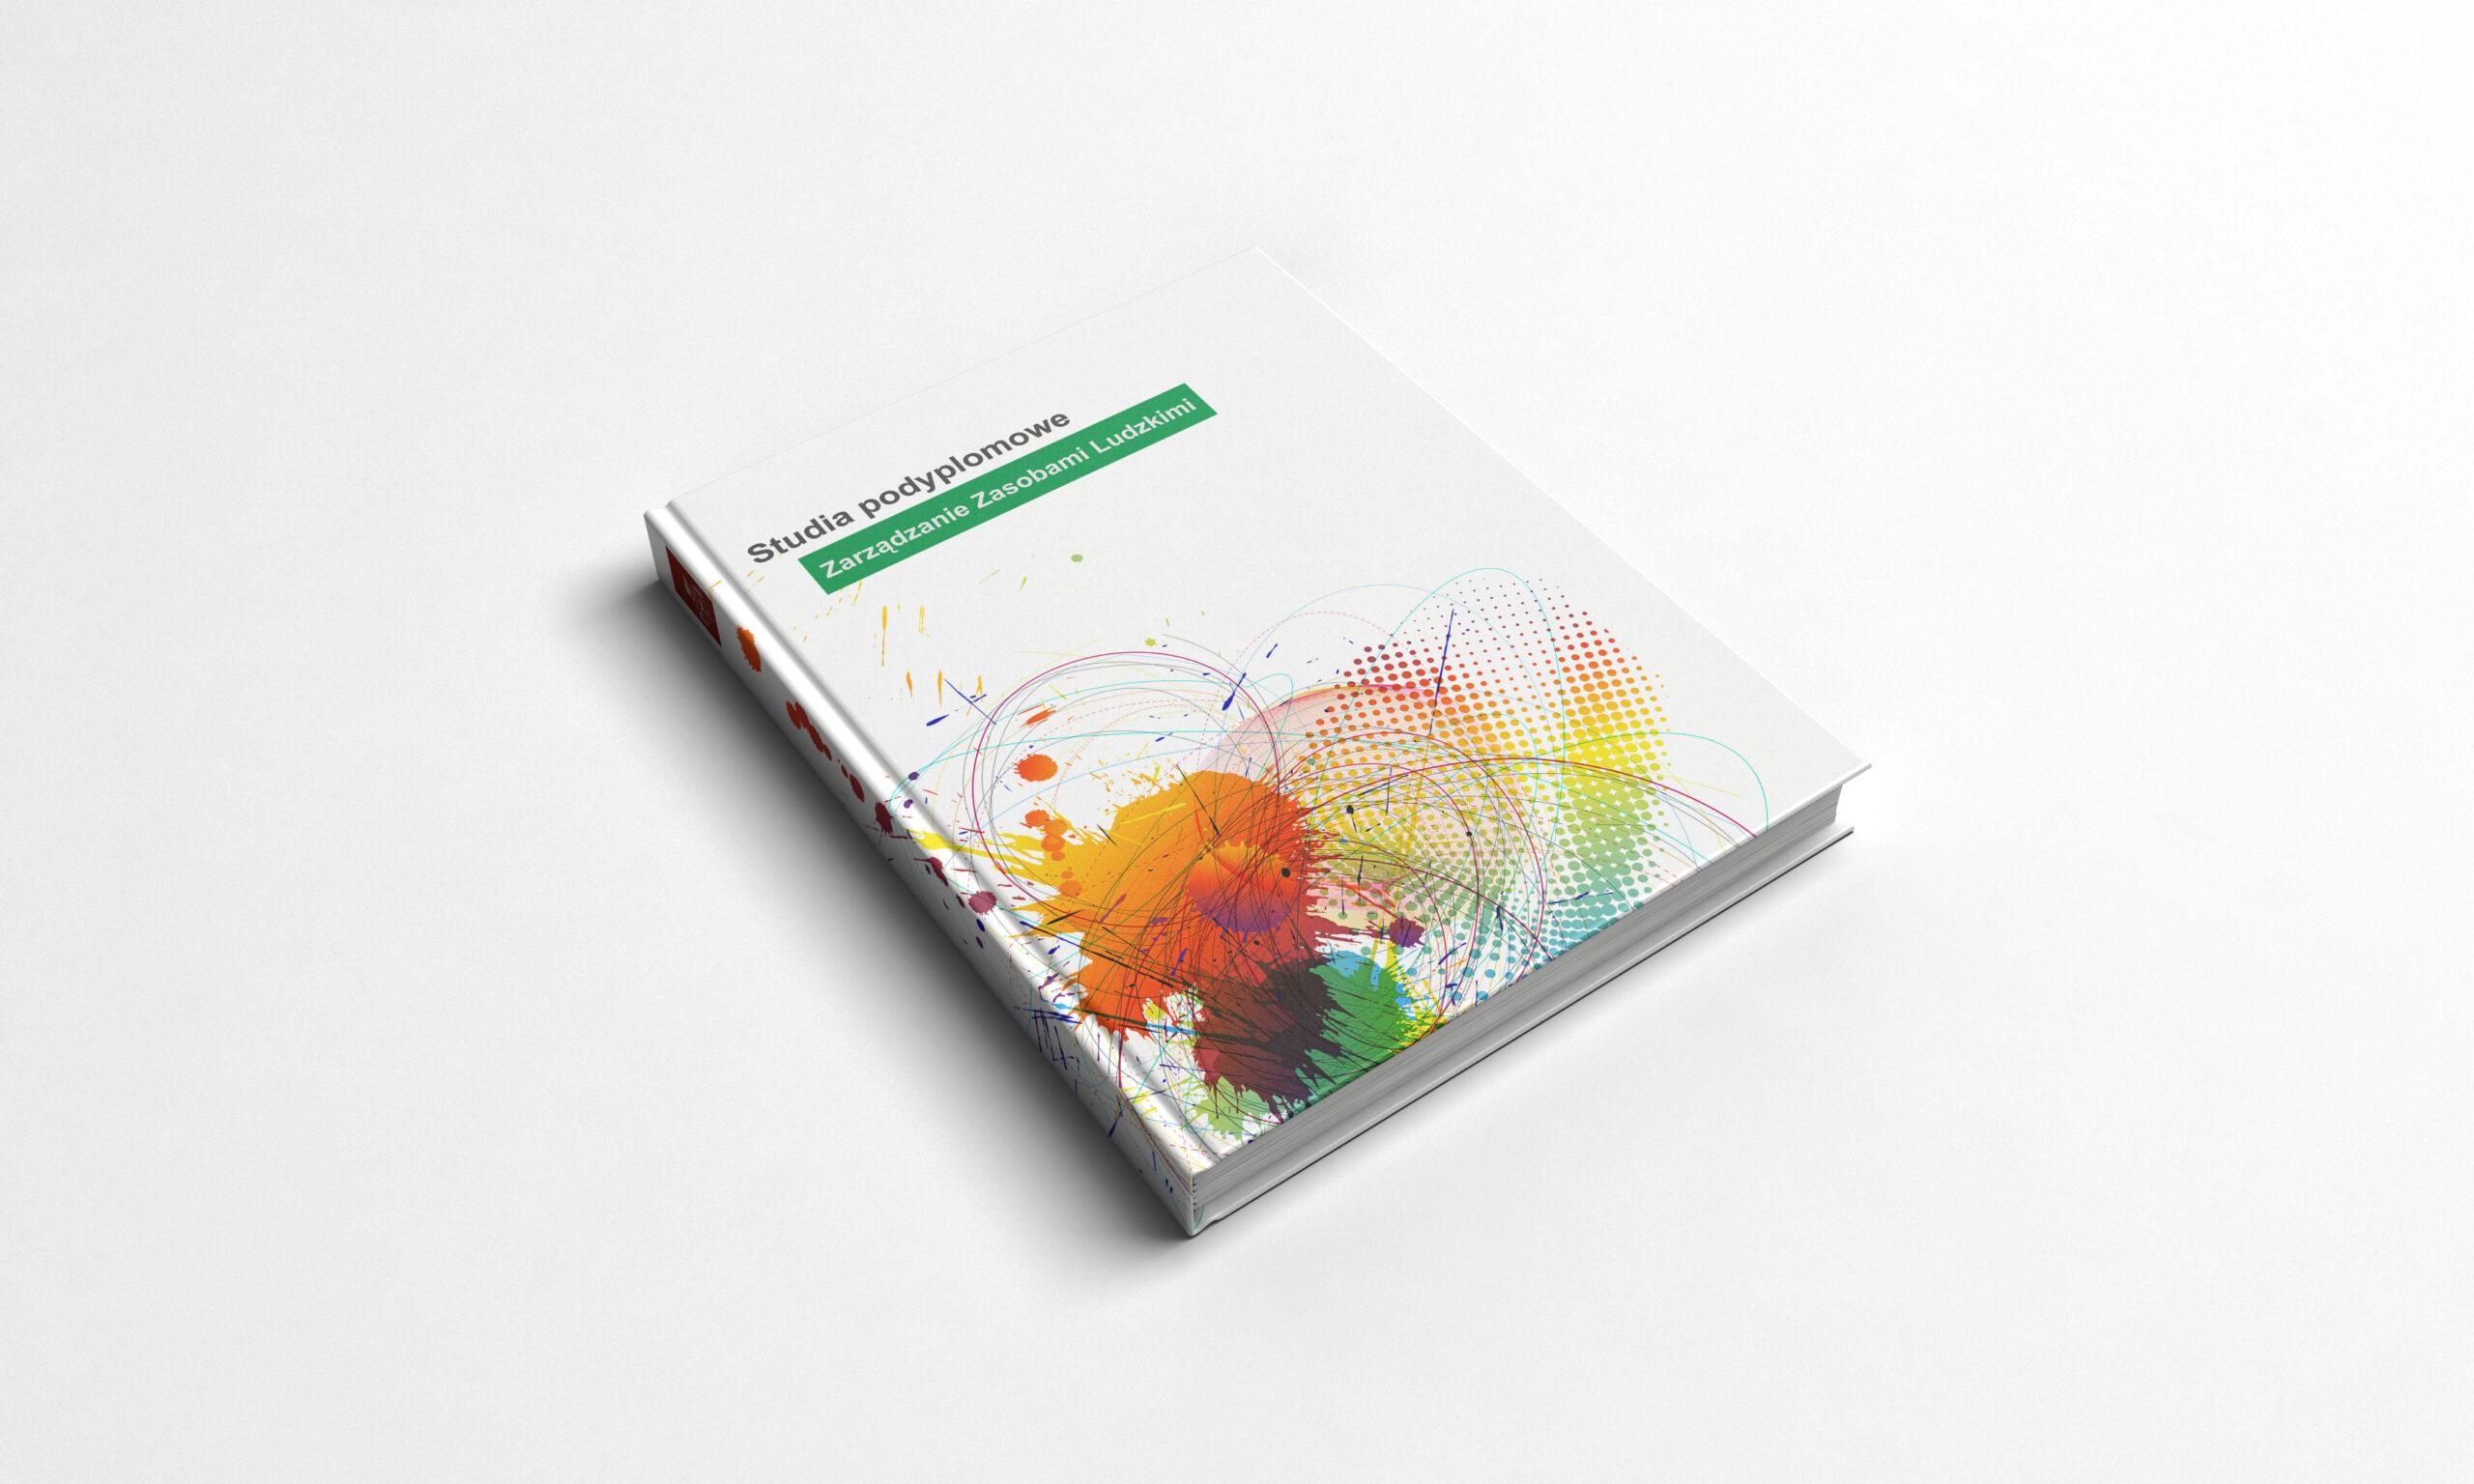 Politechnika Łódzka – okładka książki